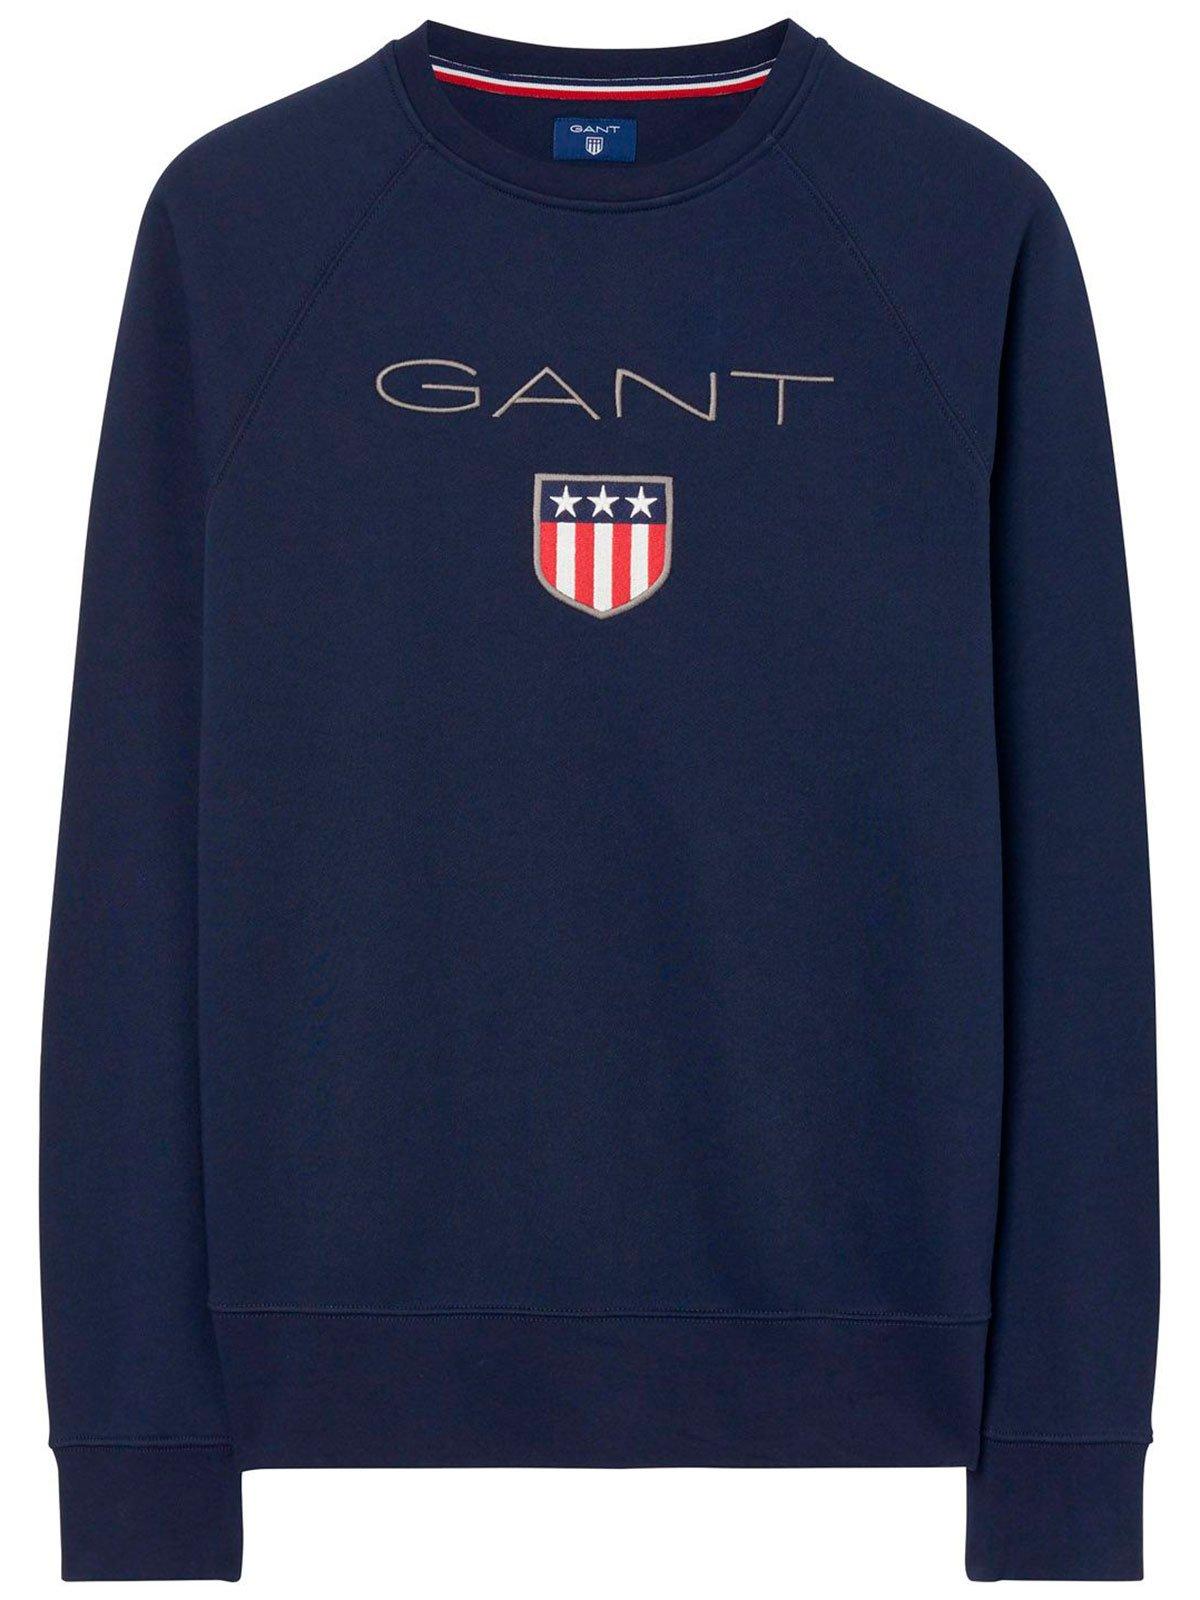 GANT Men's 18012046004433 Blue Cotton Sweatshirt